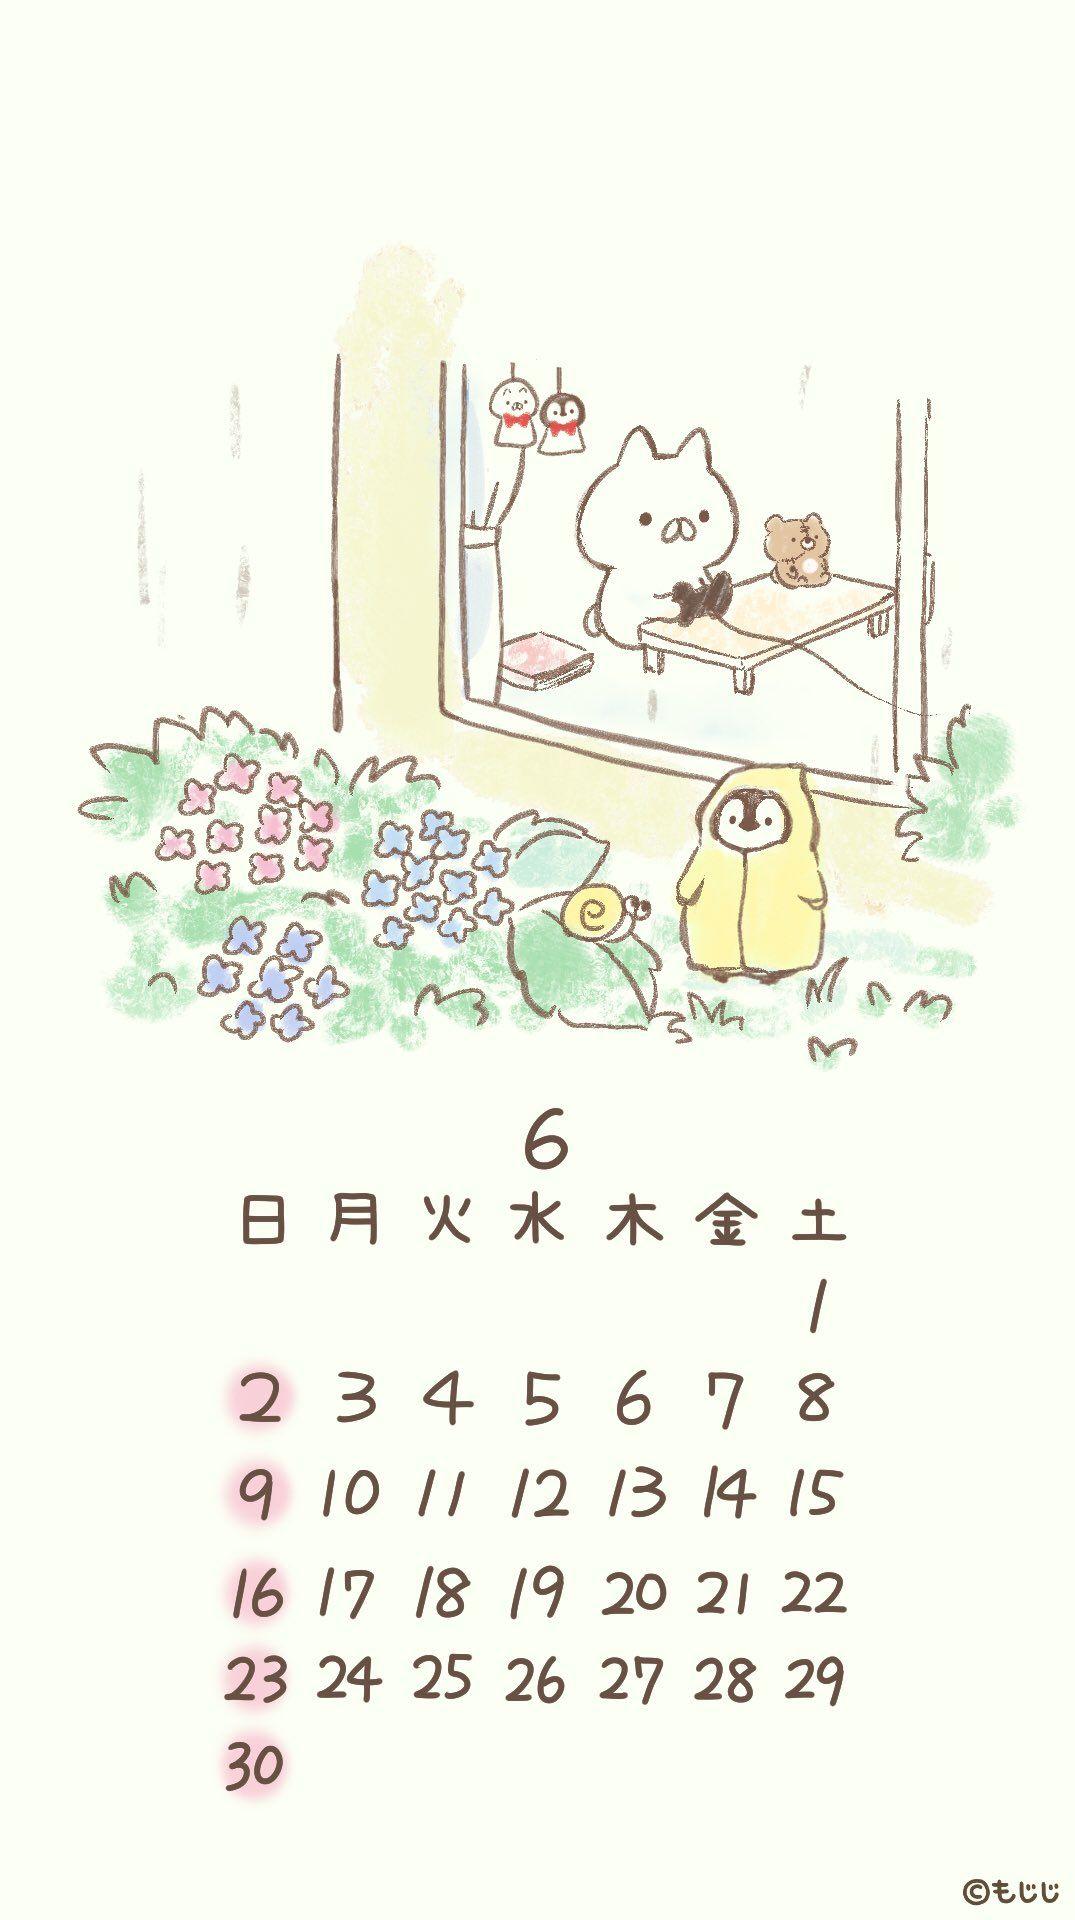 Twitter スマホ 壁紙 可愛い かわいい 壁紙 Iphone カレンダー